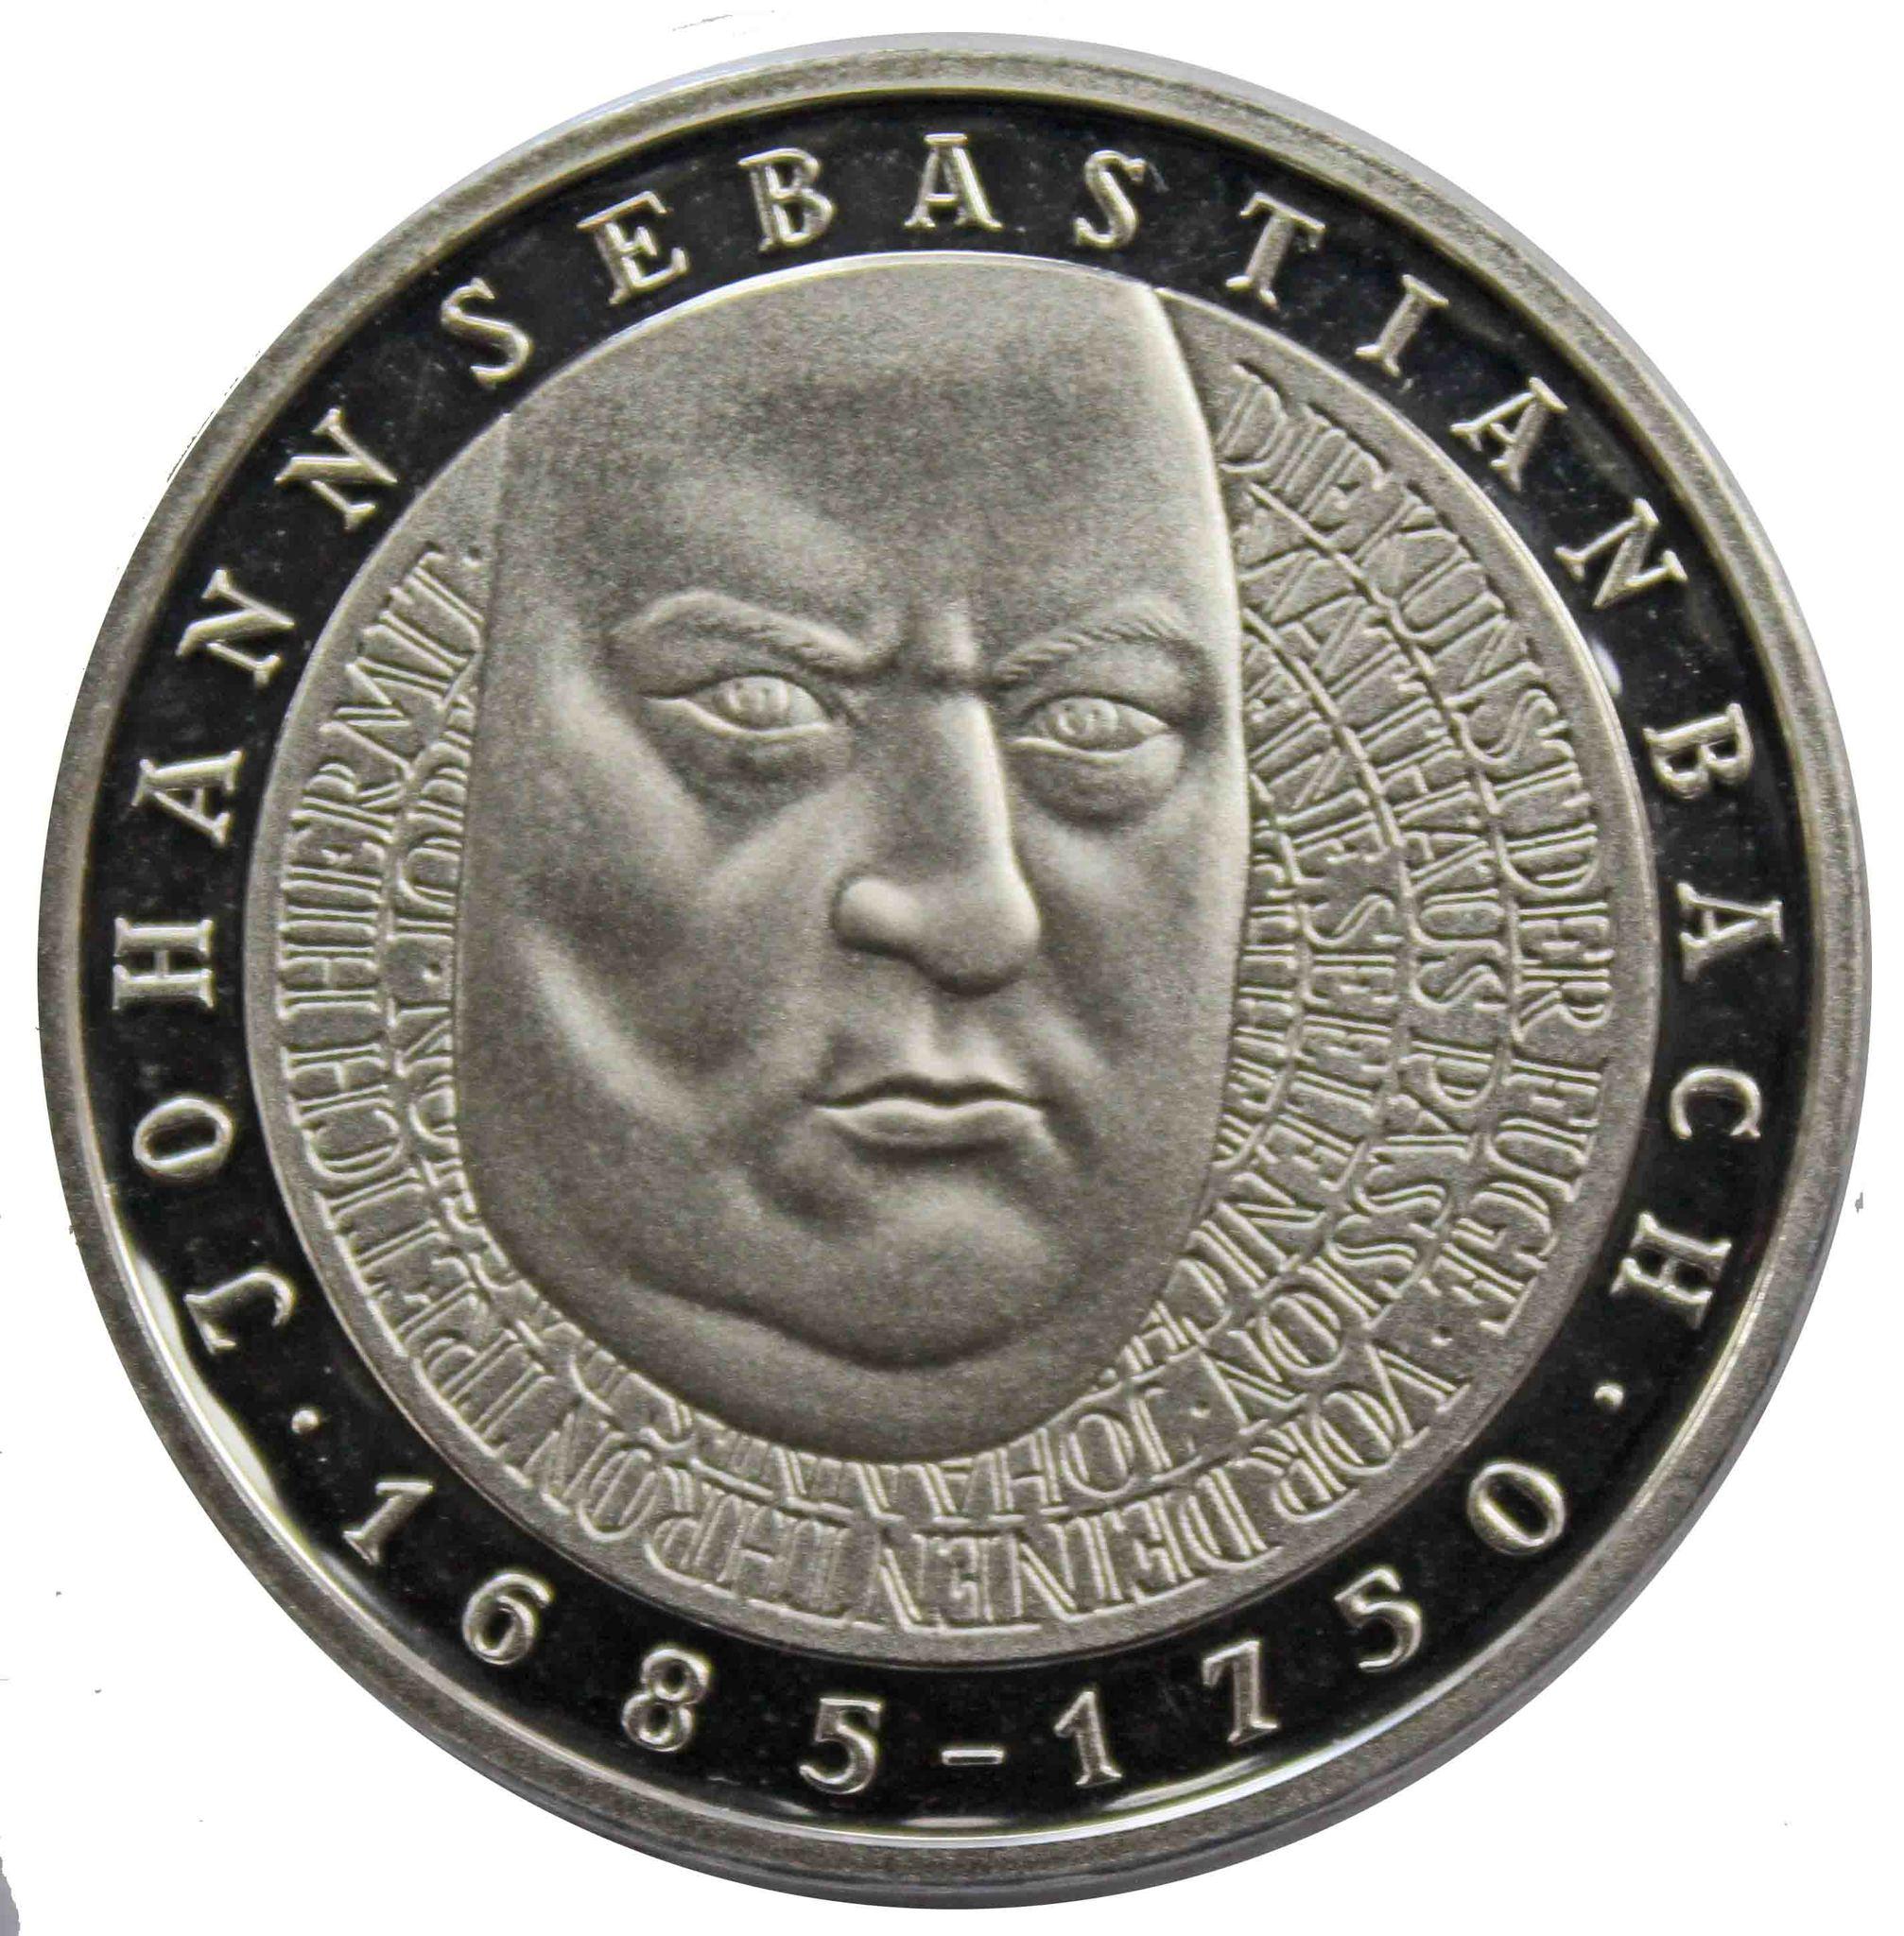 10 марок. 250 лет со дня смерти Иоганна Себастьяна Баха (J). Серебро. 2000 г. PROOF. В родной запайке